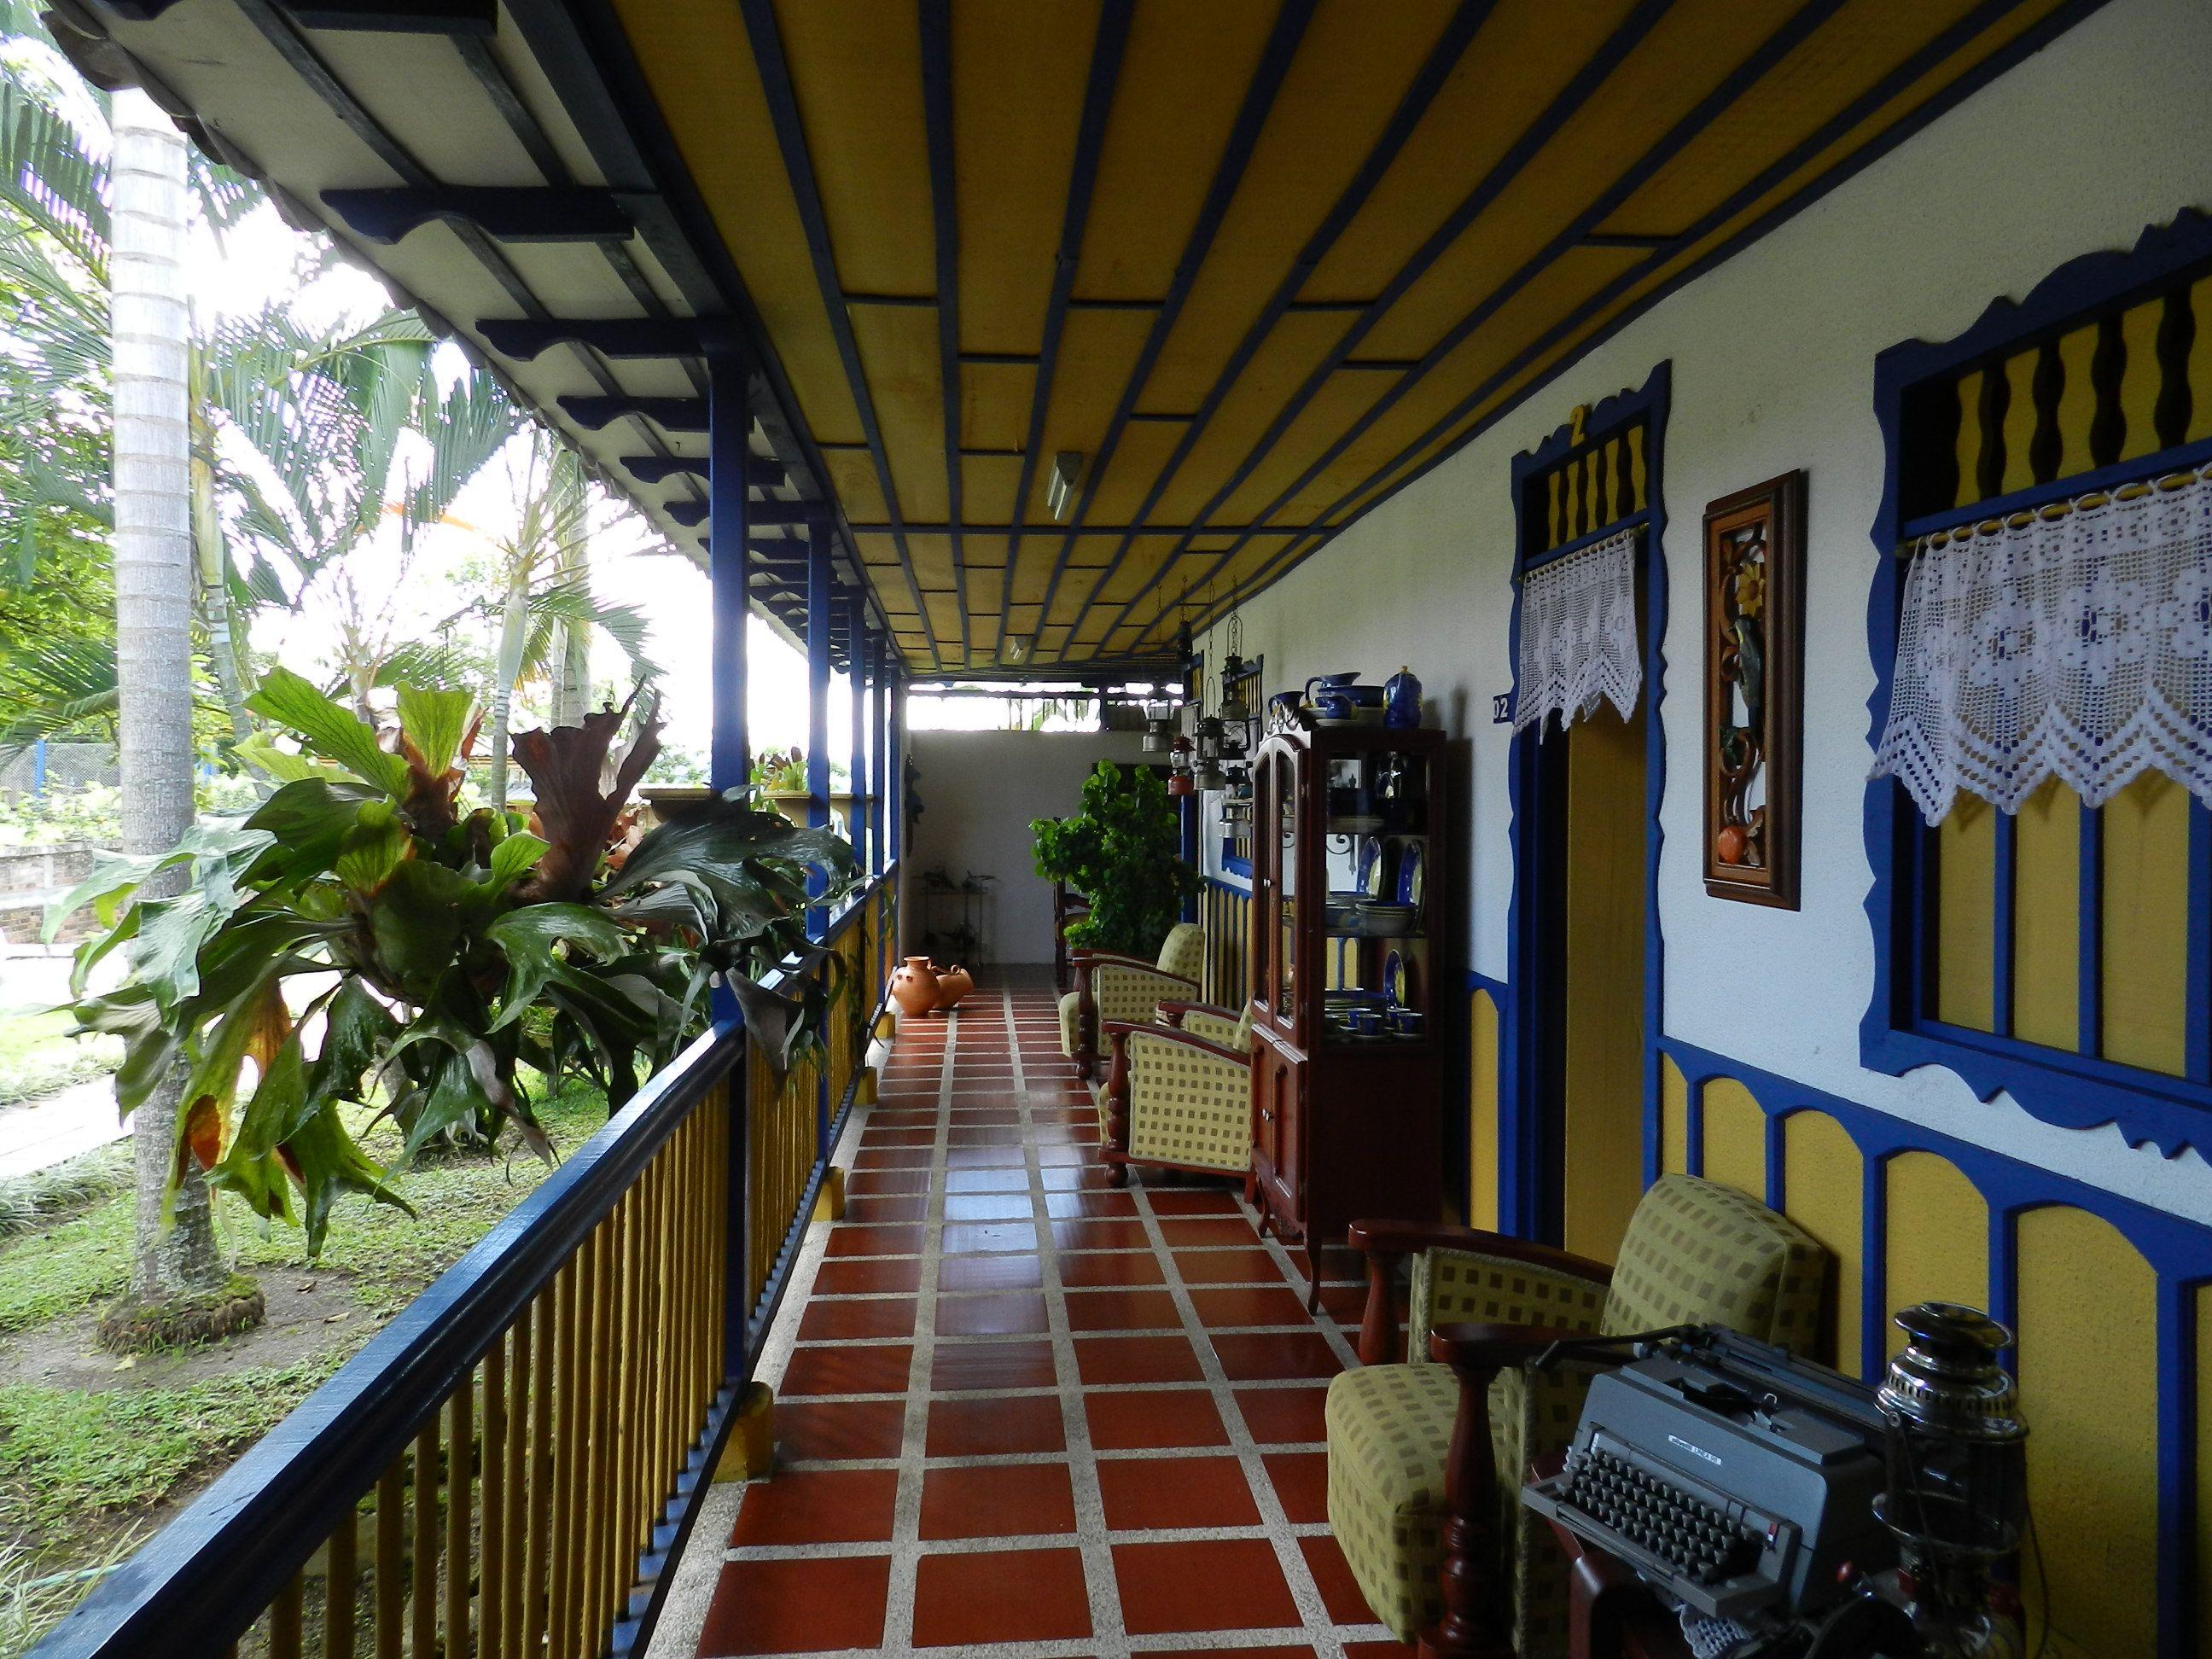 Hoteles fincas coloniales quindio finca pinterest for Modelos de fincas campestres